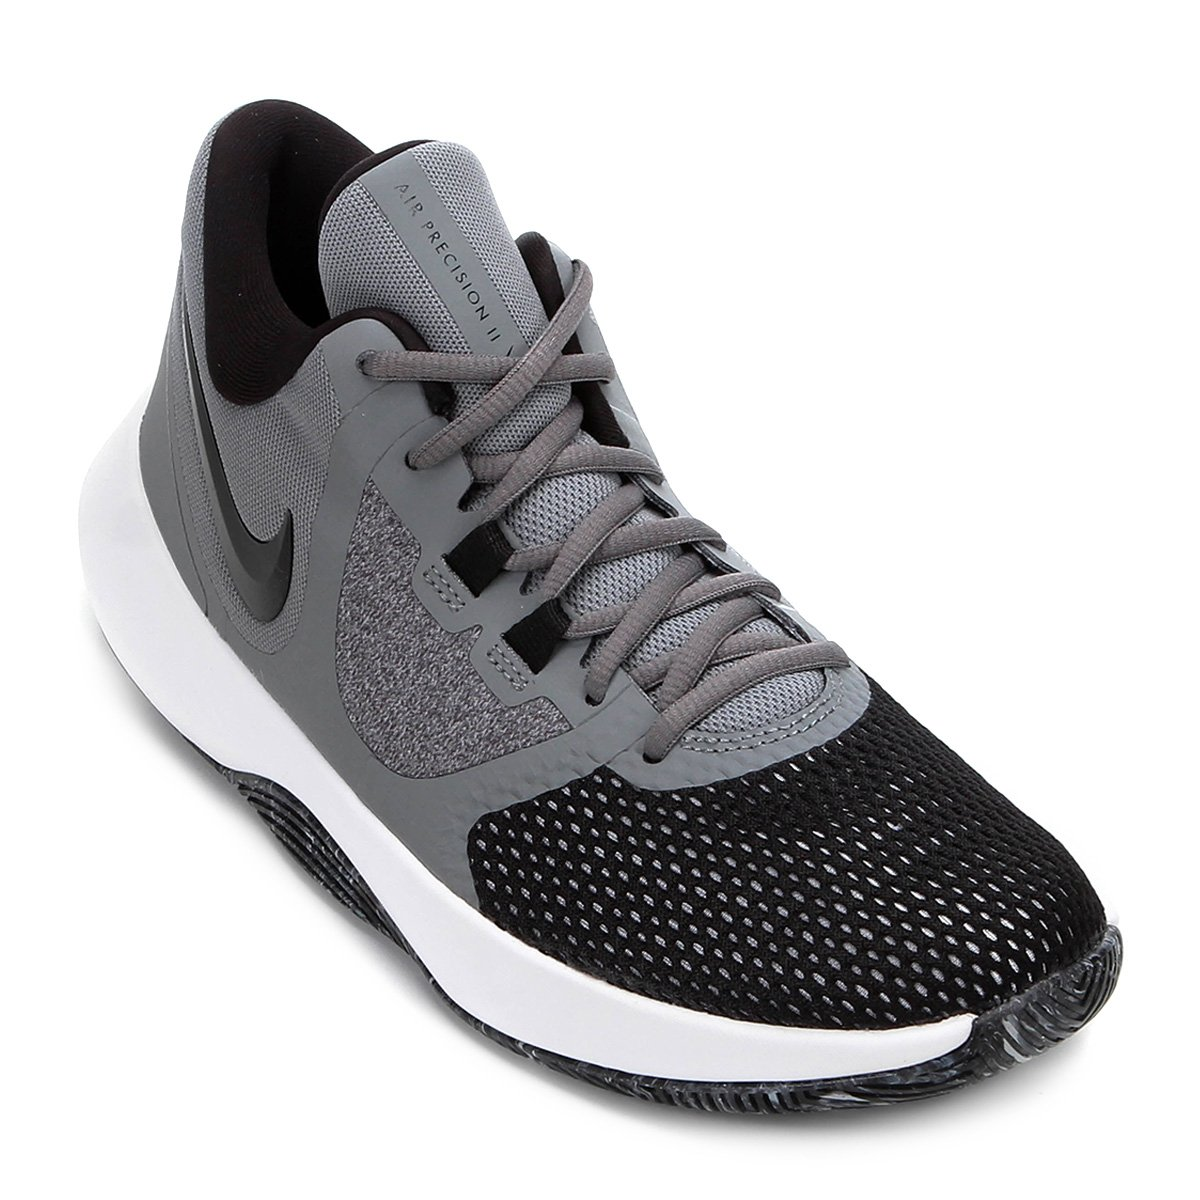 4f6b463814 Tênis Nike Air Precision II Masculino - Cinza e Preto